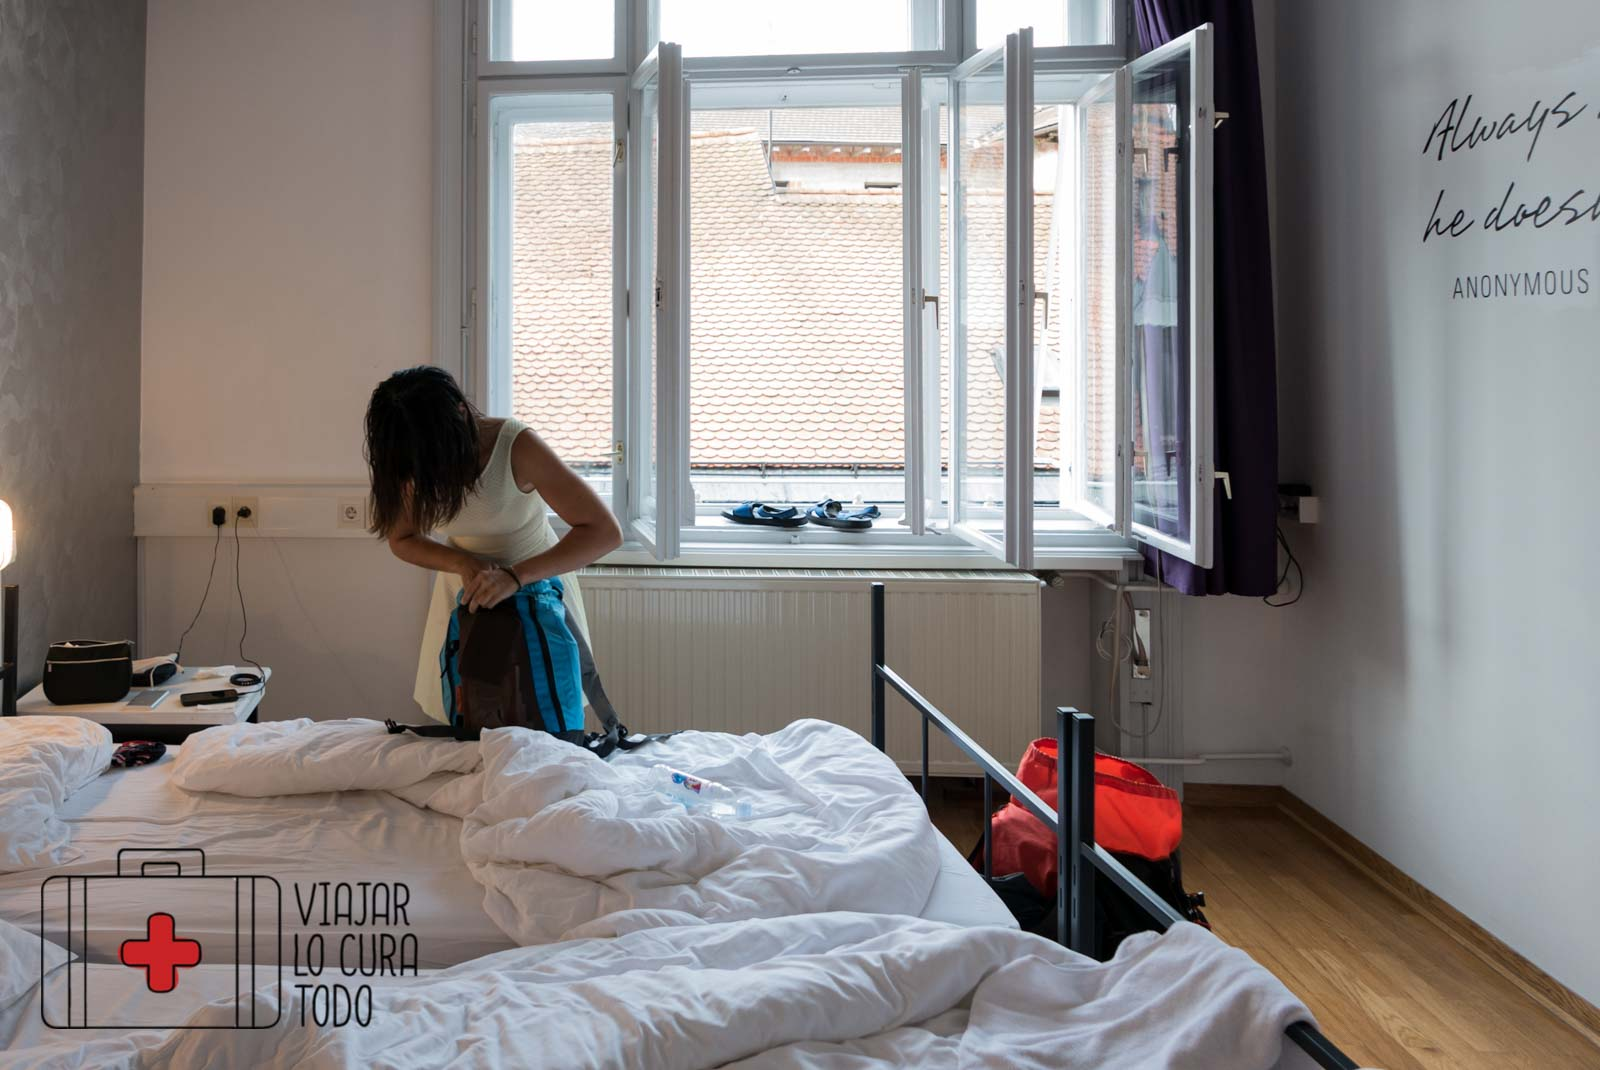 Dónde dormir en Ljubljana